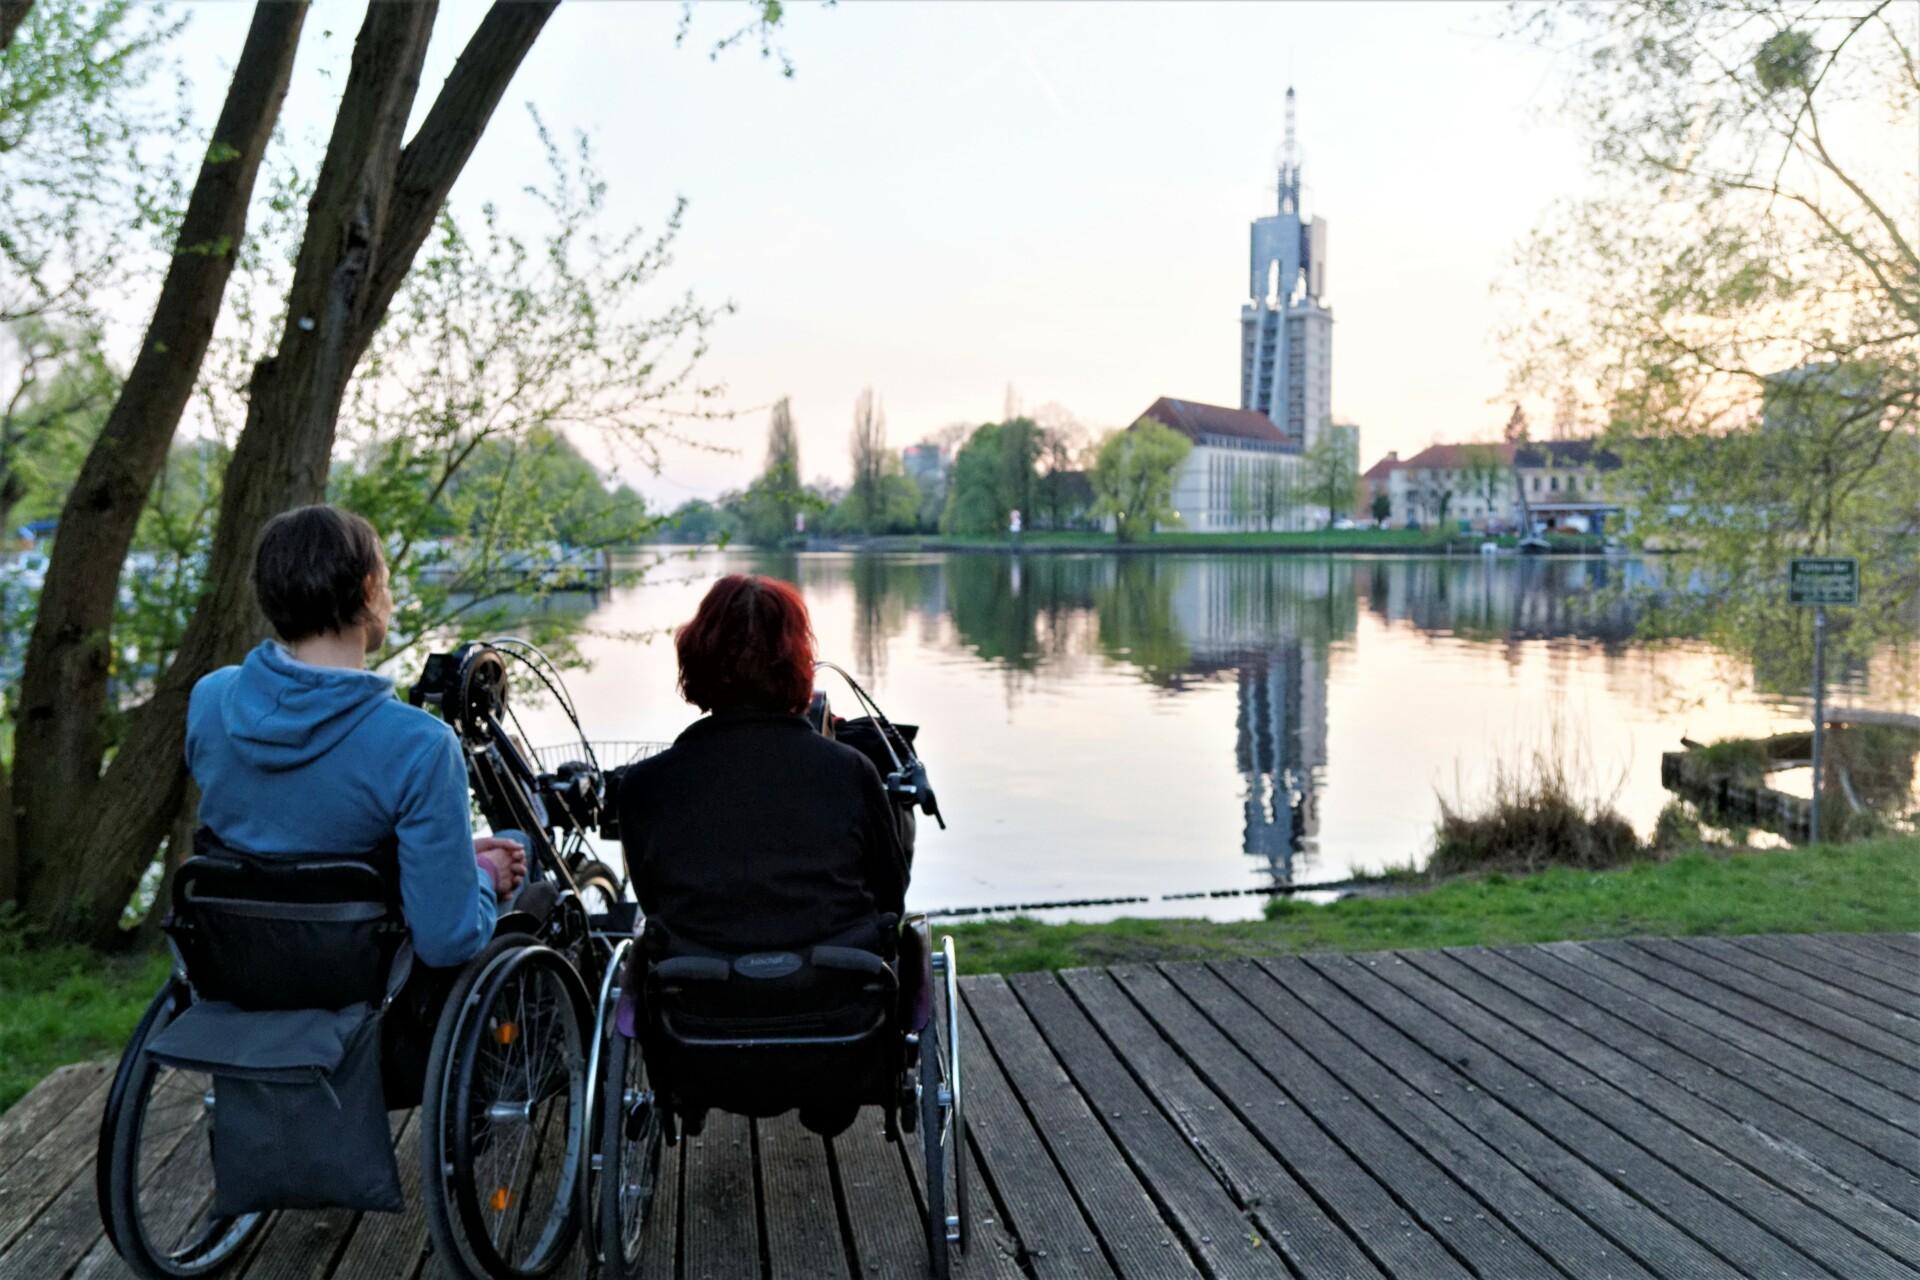 Barrierefreies Potsdam, Foto: PMSG/ André Stiebitz